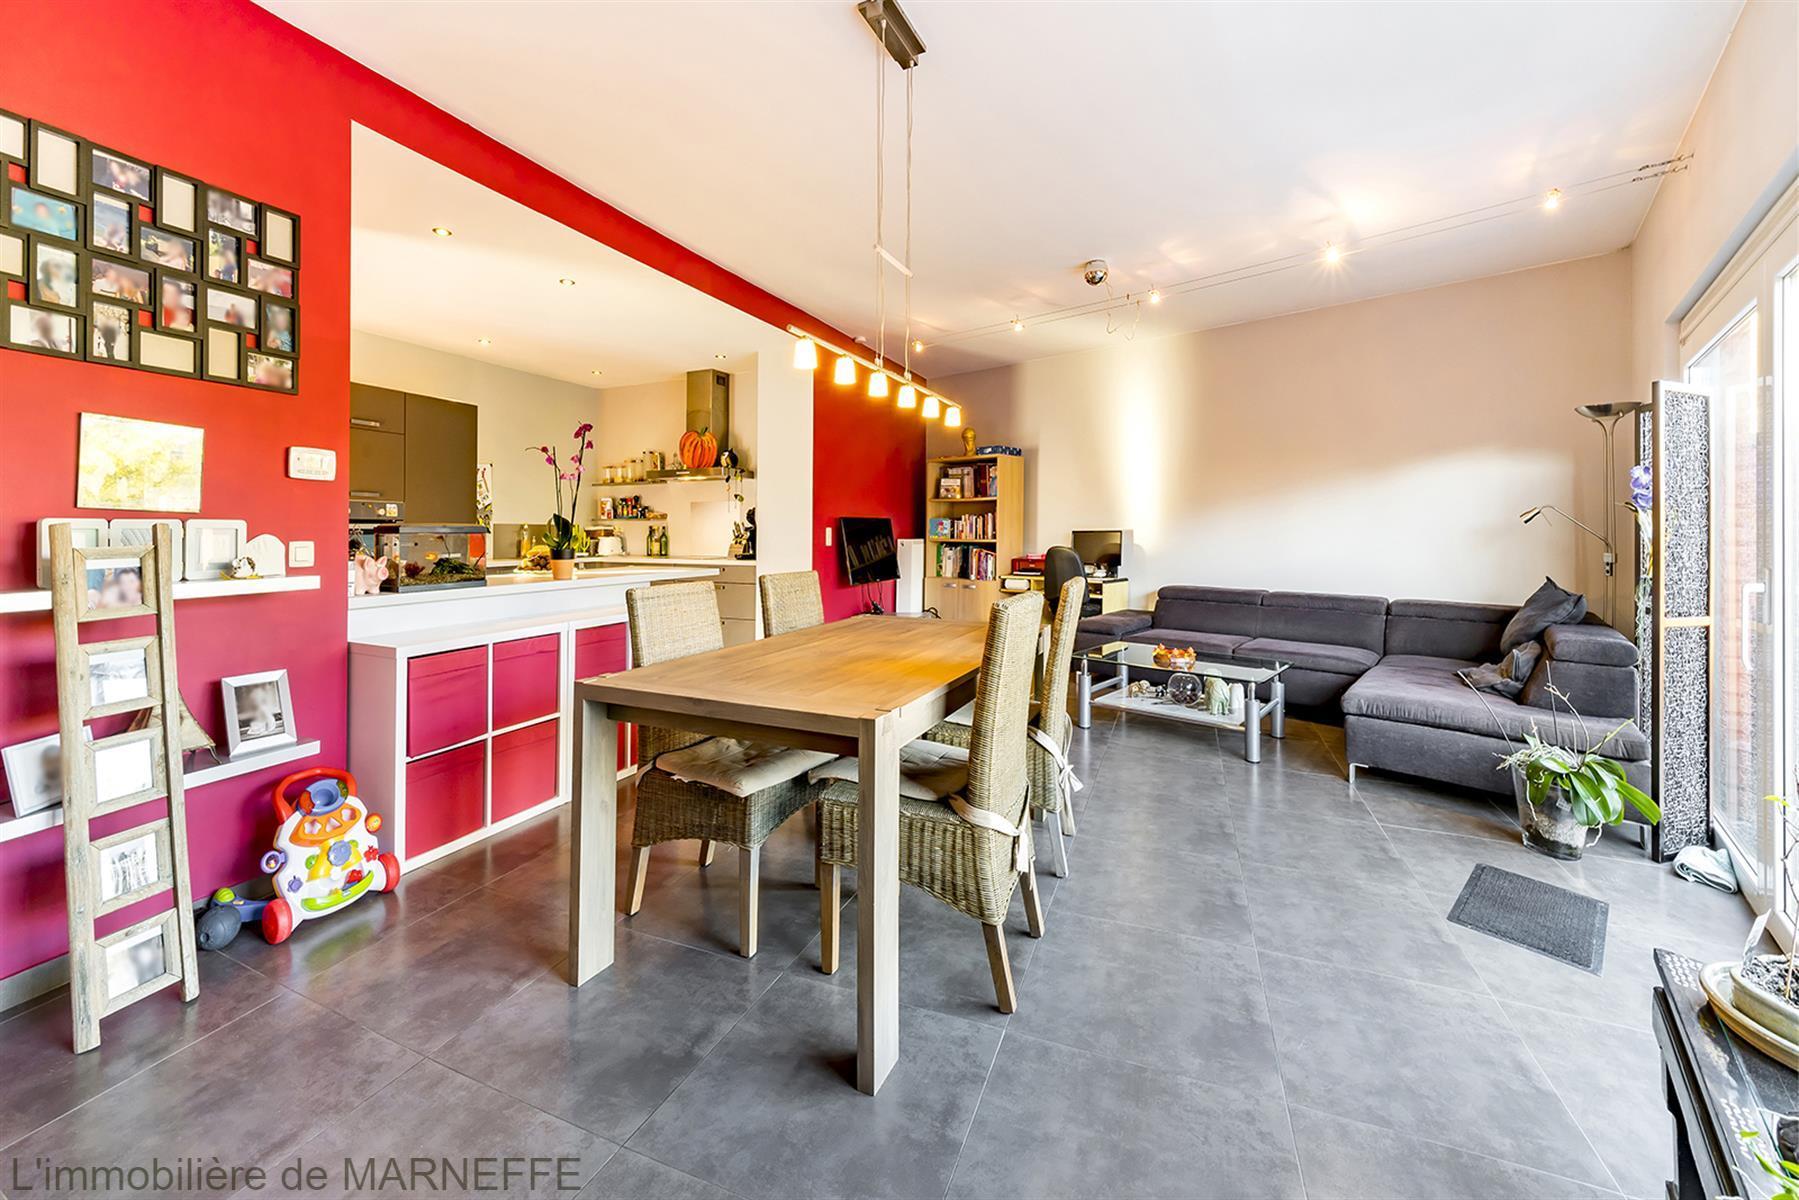 Appartement avec jardin - Orp-Jauche - #3625402-1